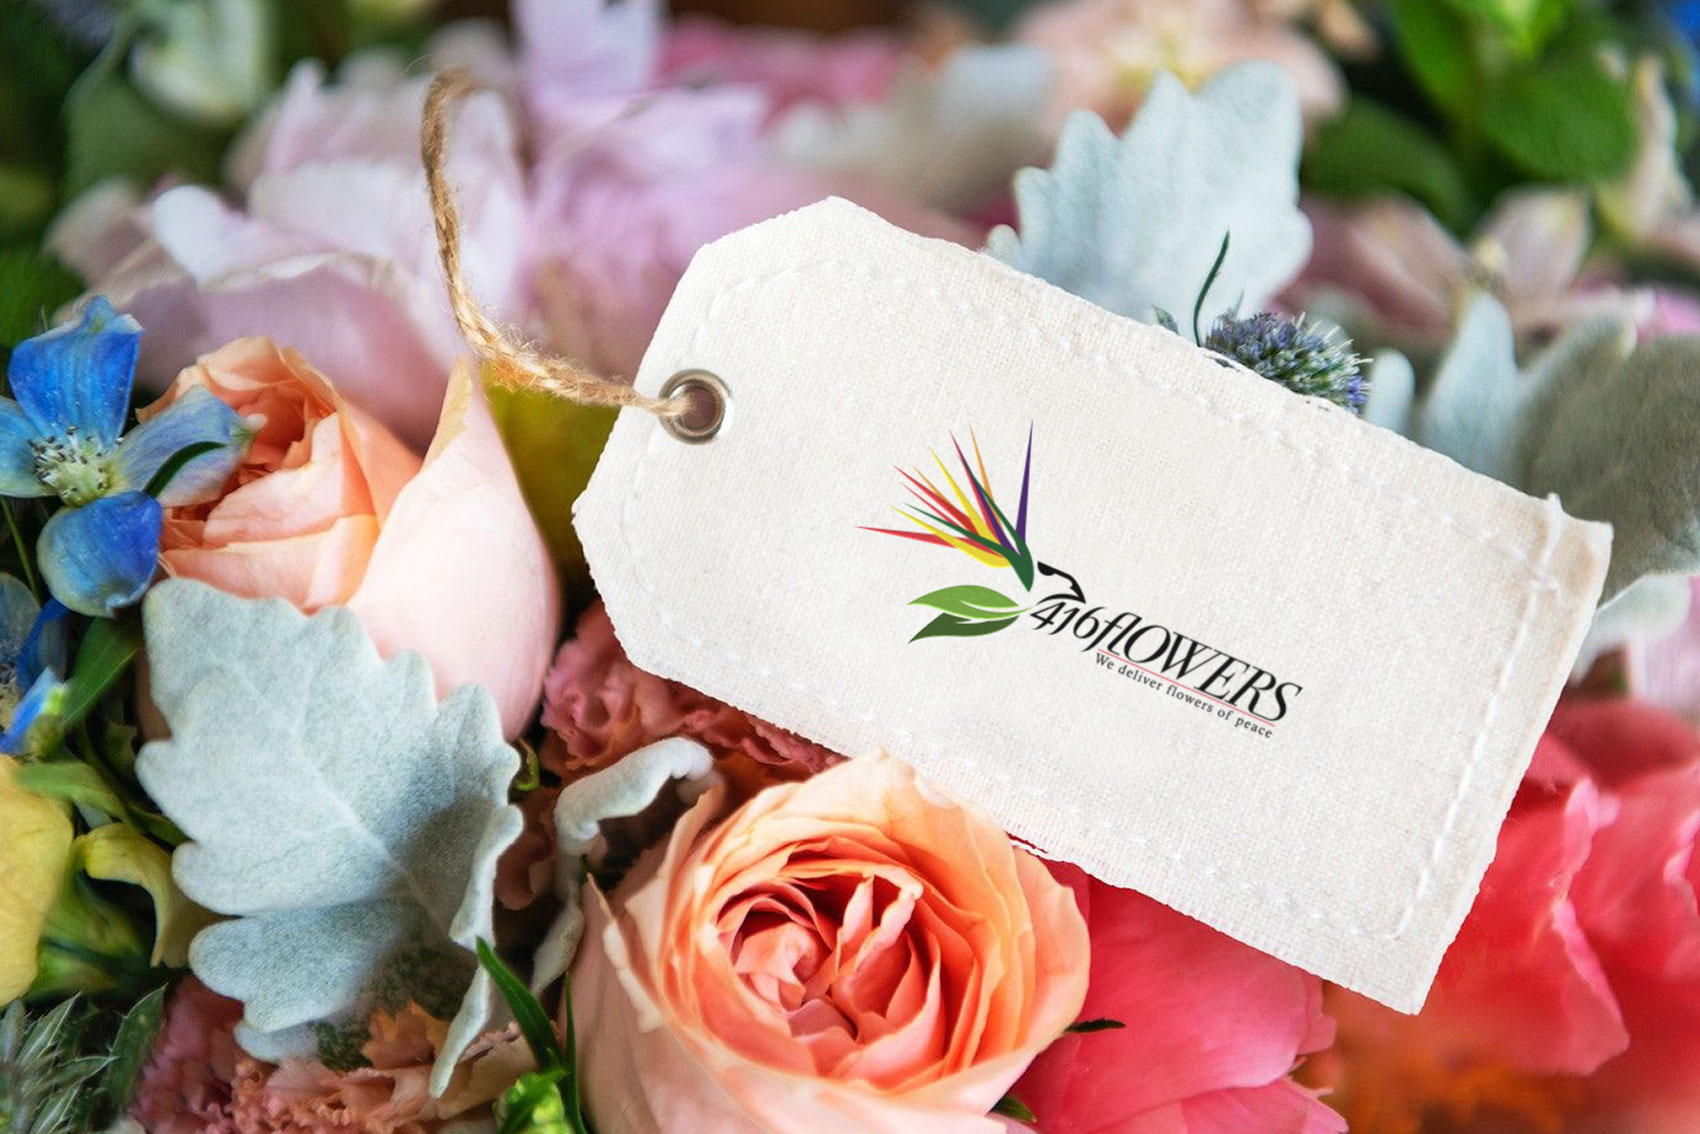 416-flowers